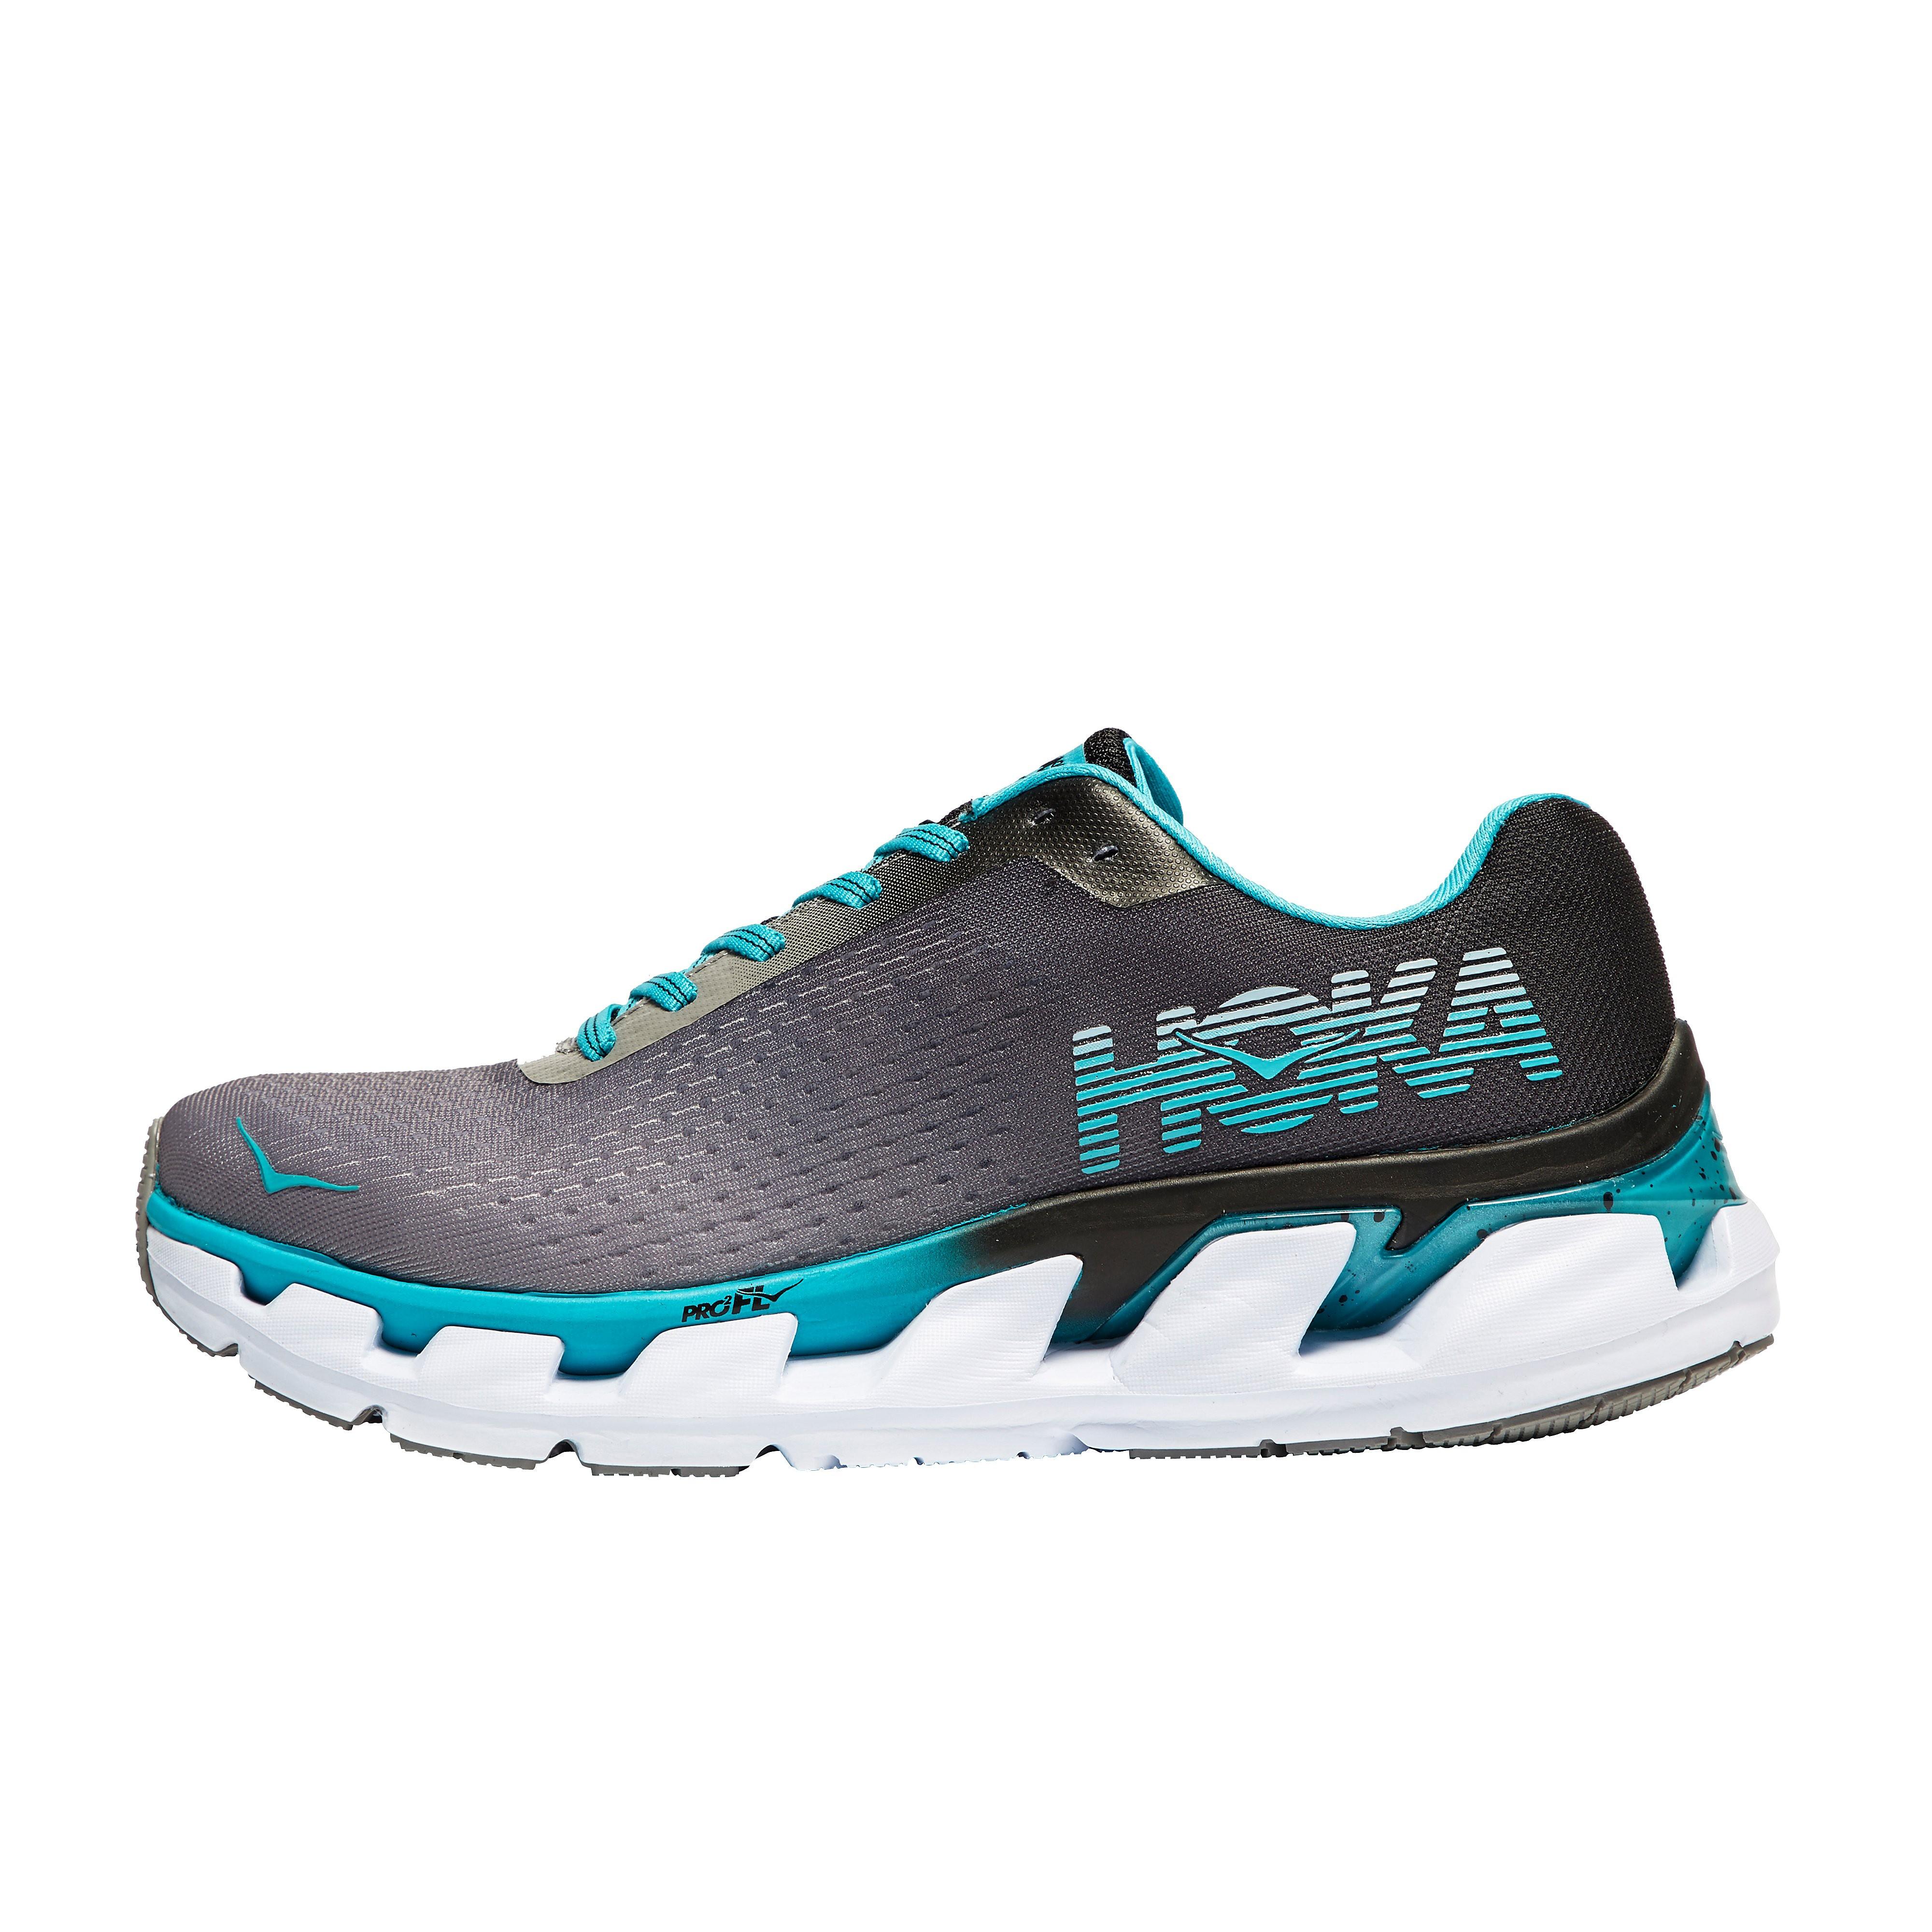 Hoka one one Elevon Women's Running Shoes